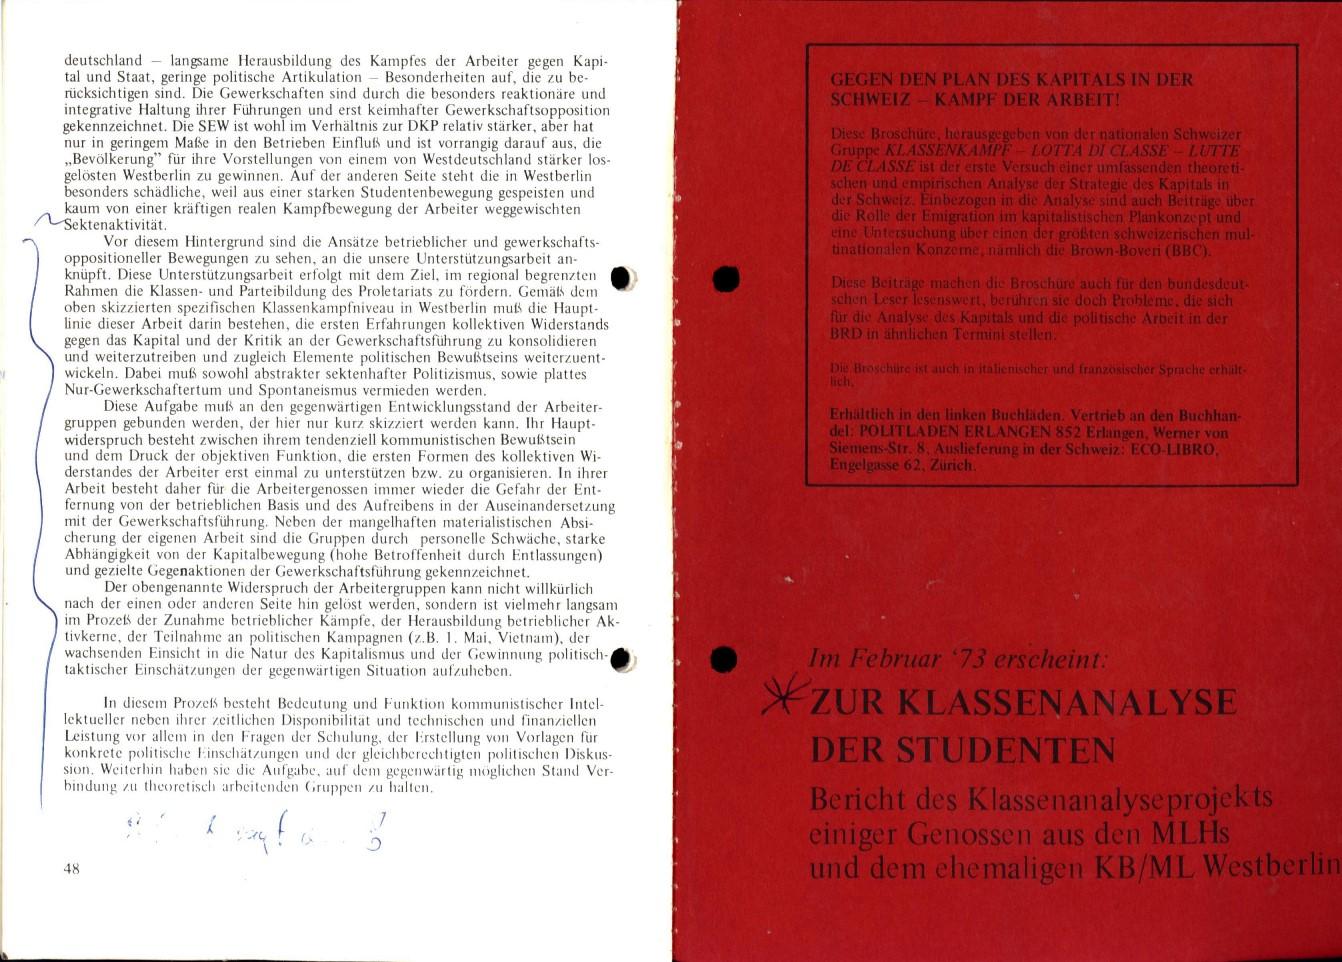 Berlin_KBML_Kommunist_1973_04s_26